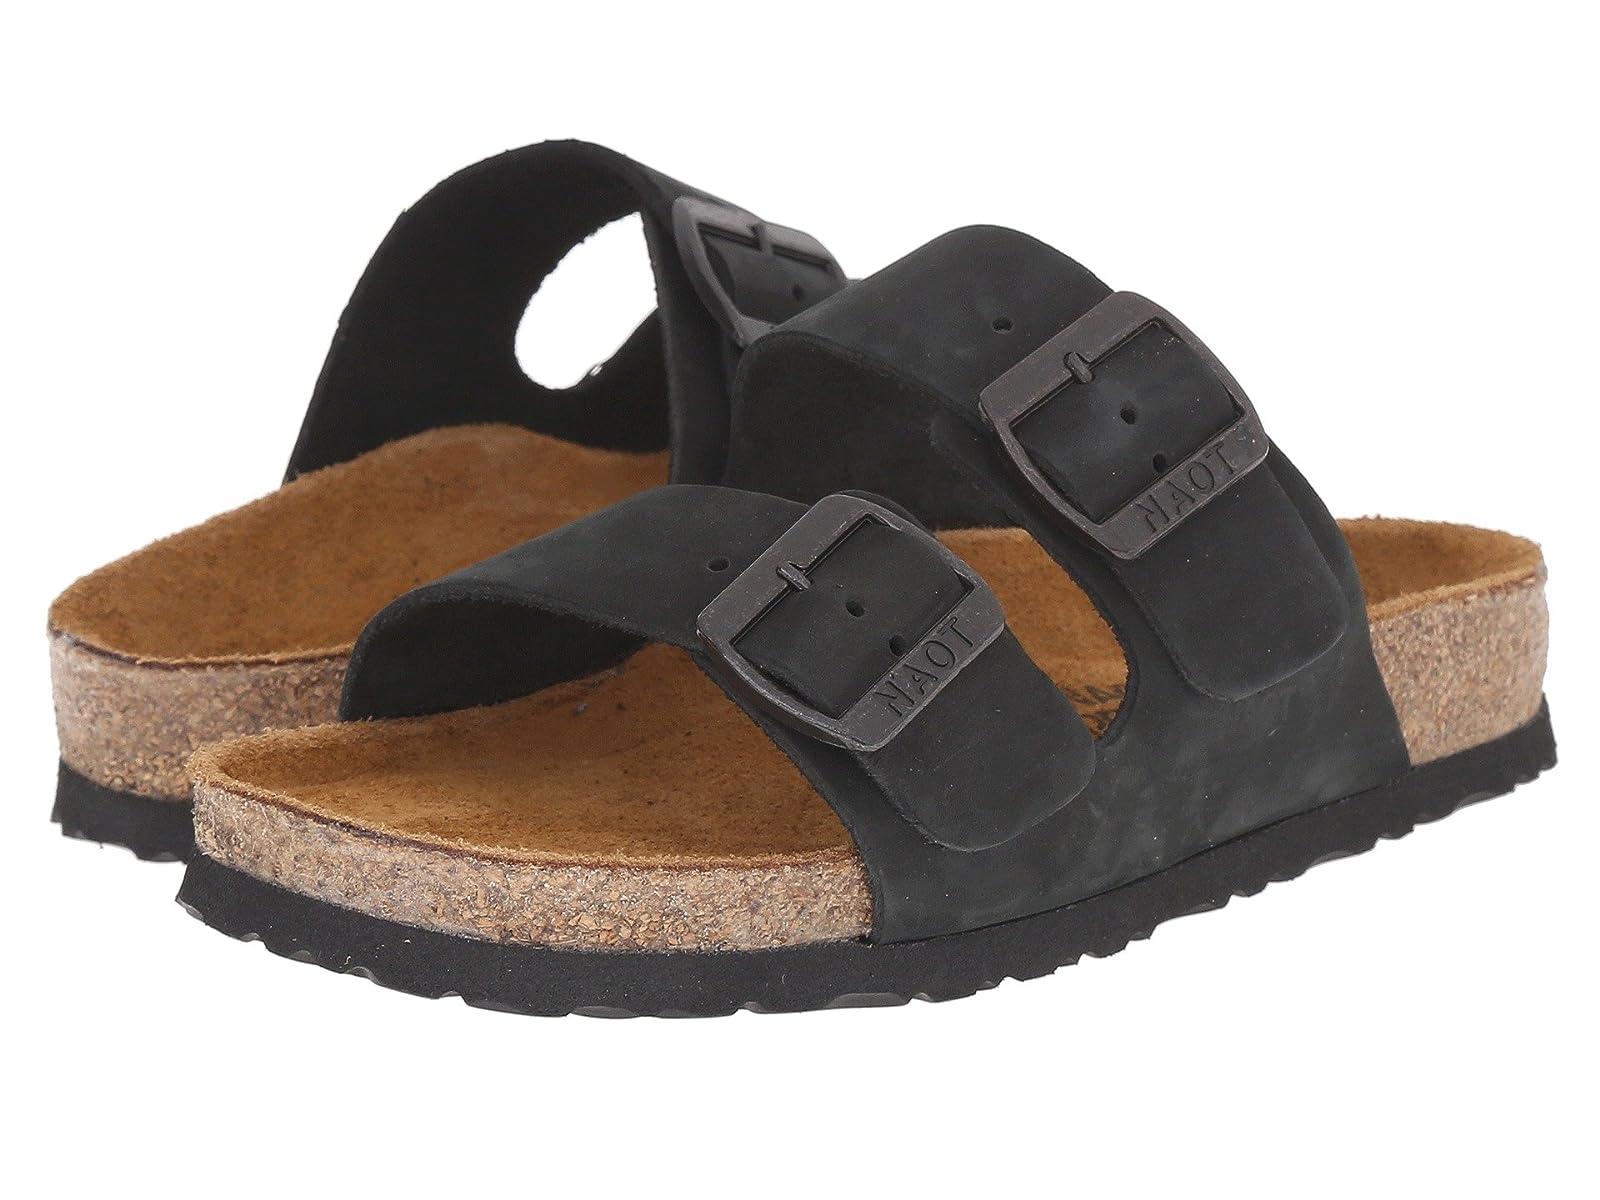 Naot Santa BarbaraAtmospheric grades have affordable shoes